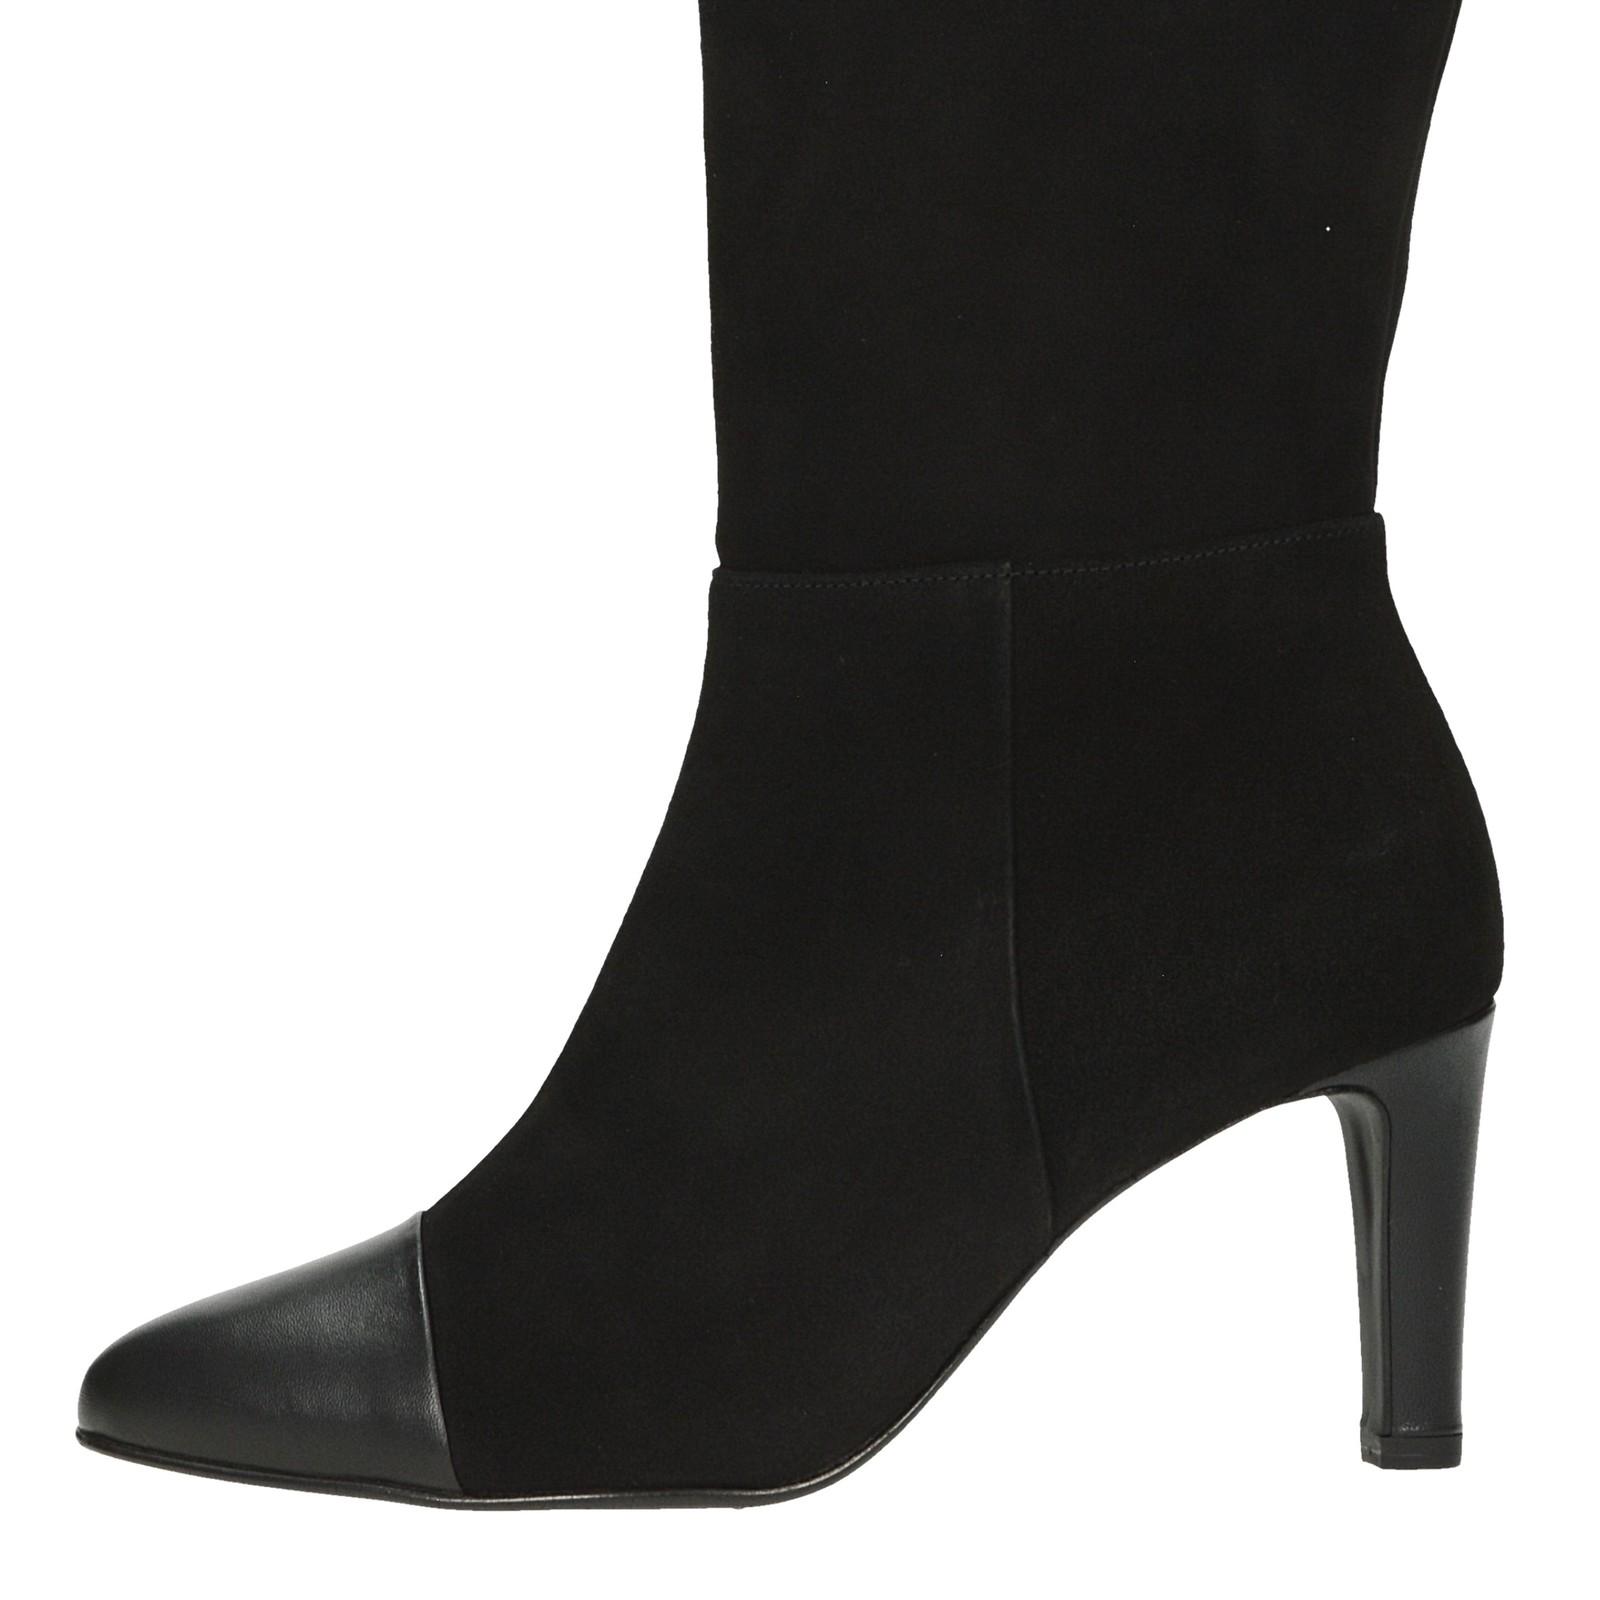 Högl dámske kožené vysoké čižmy - čierne